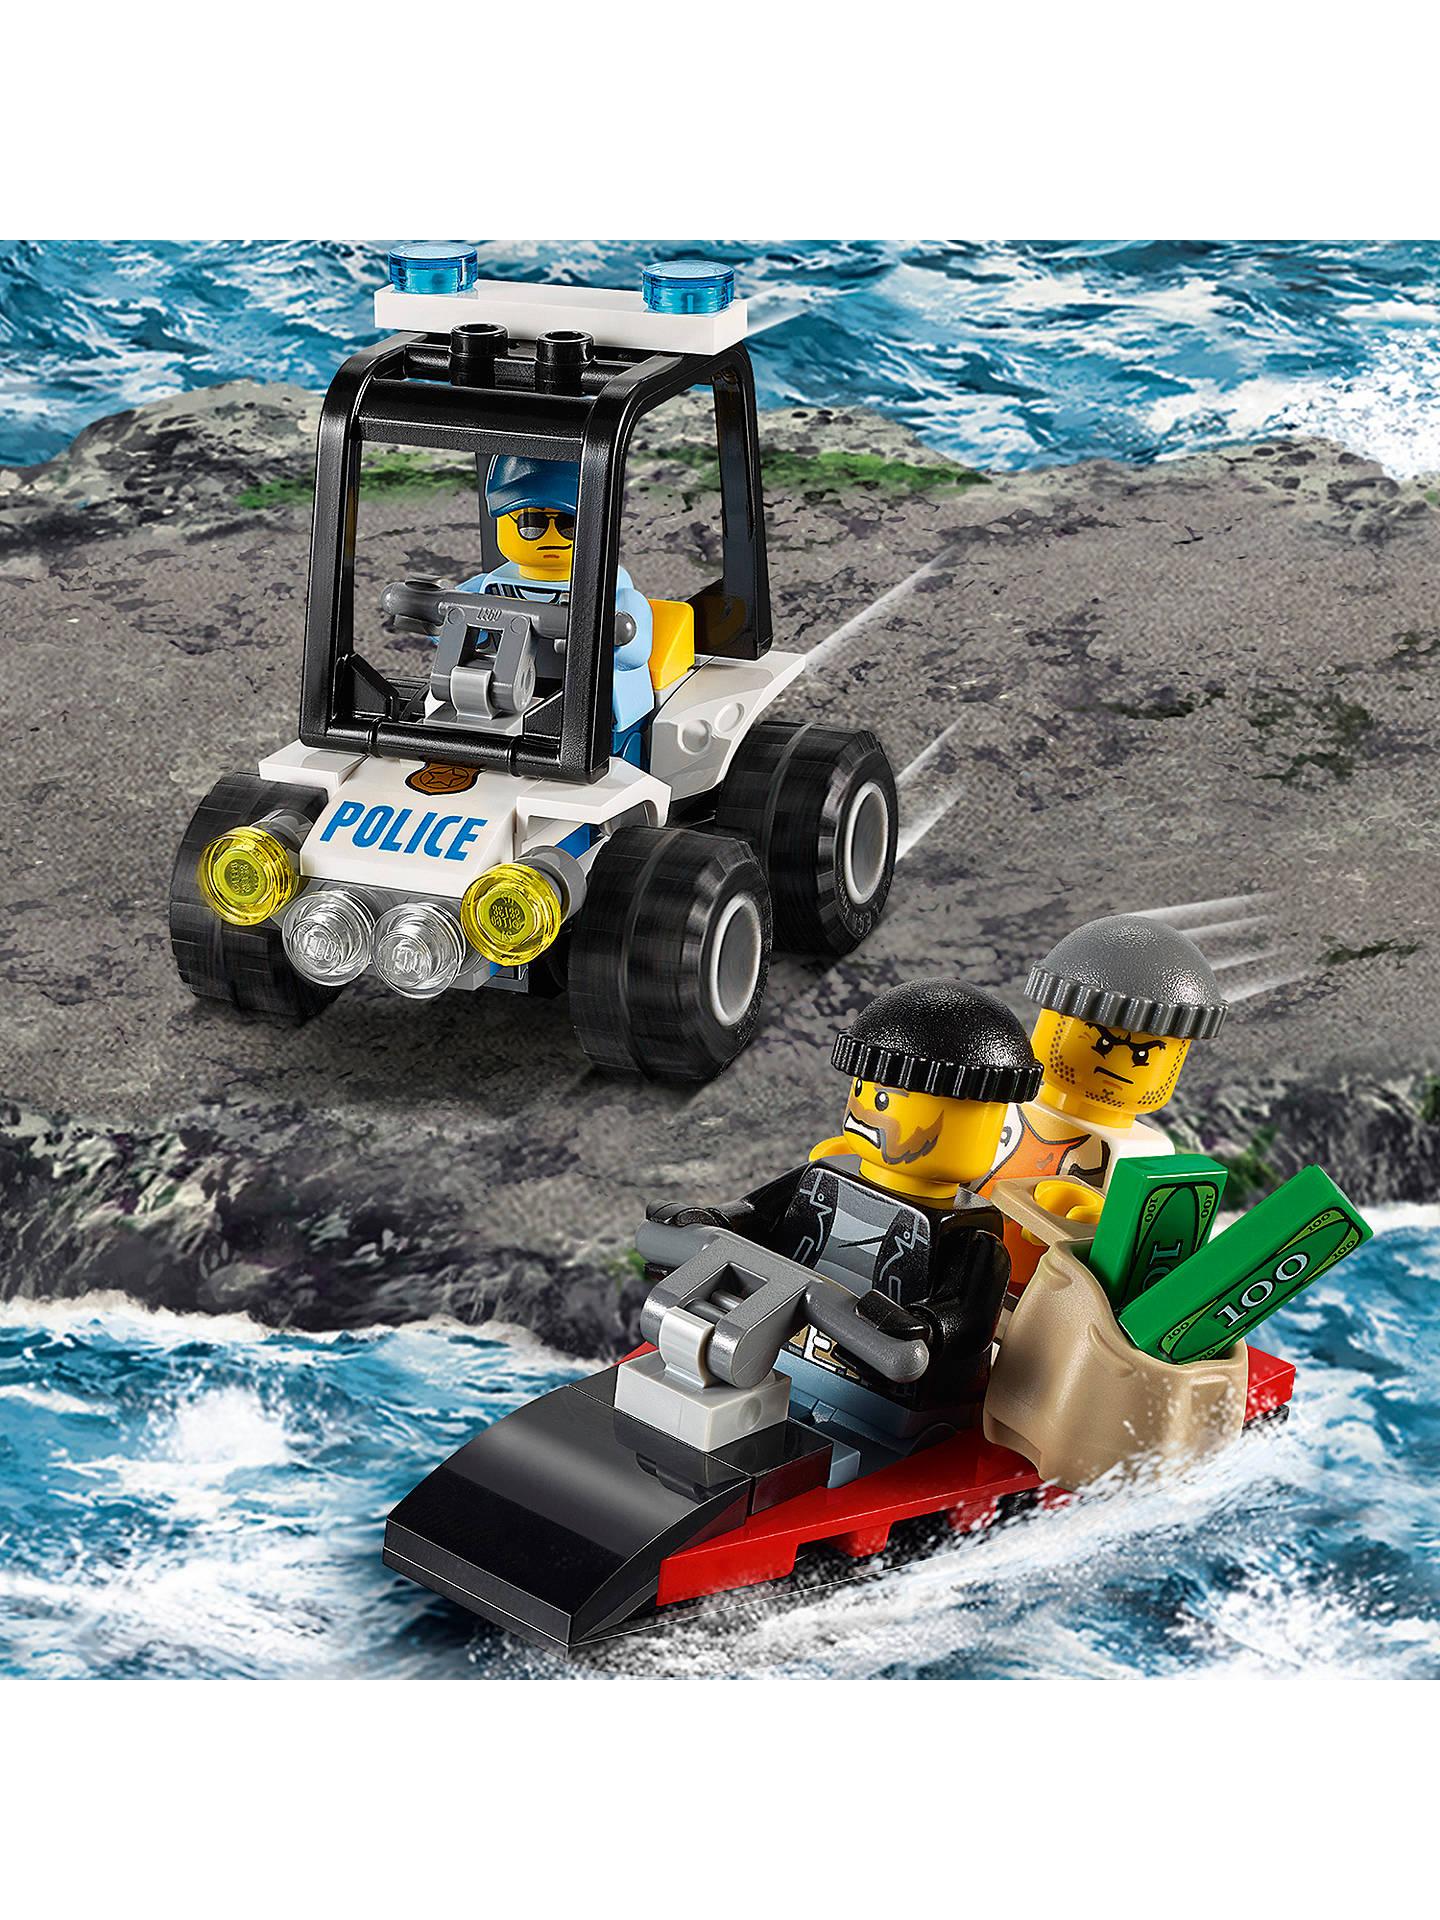 Lego City 60127 Prison Island Starter Set At John Lewis Partners Police Buylego Online